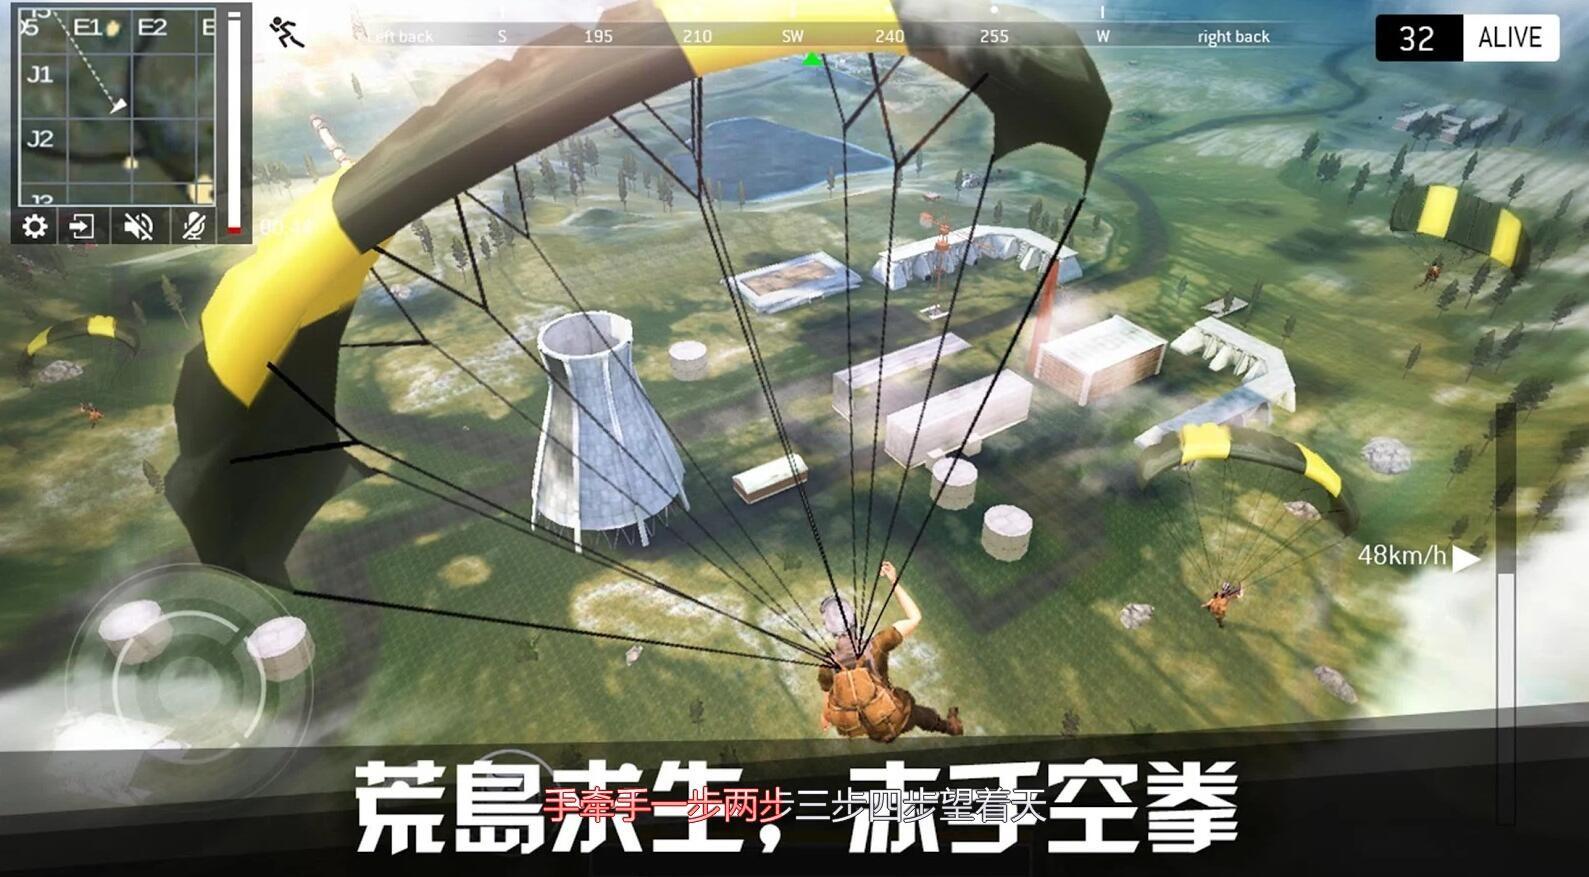 Last Battleground Survival官方网站下载正式版游戏(终极战场生存)图5: